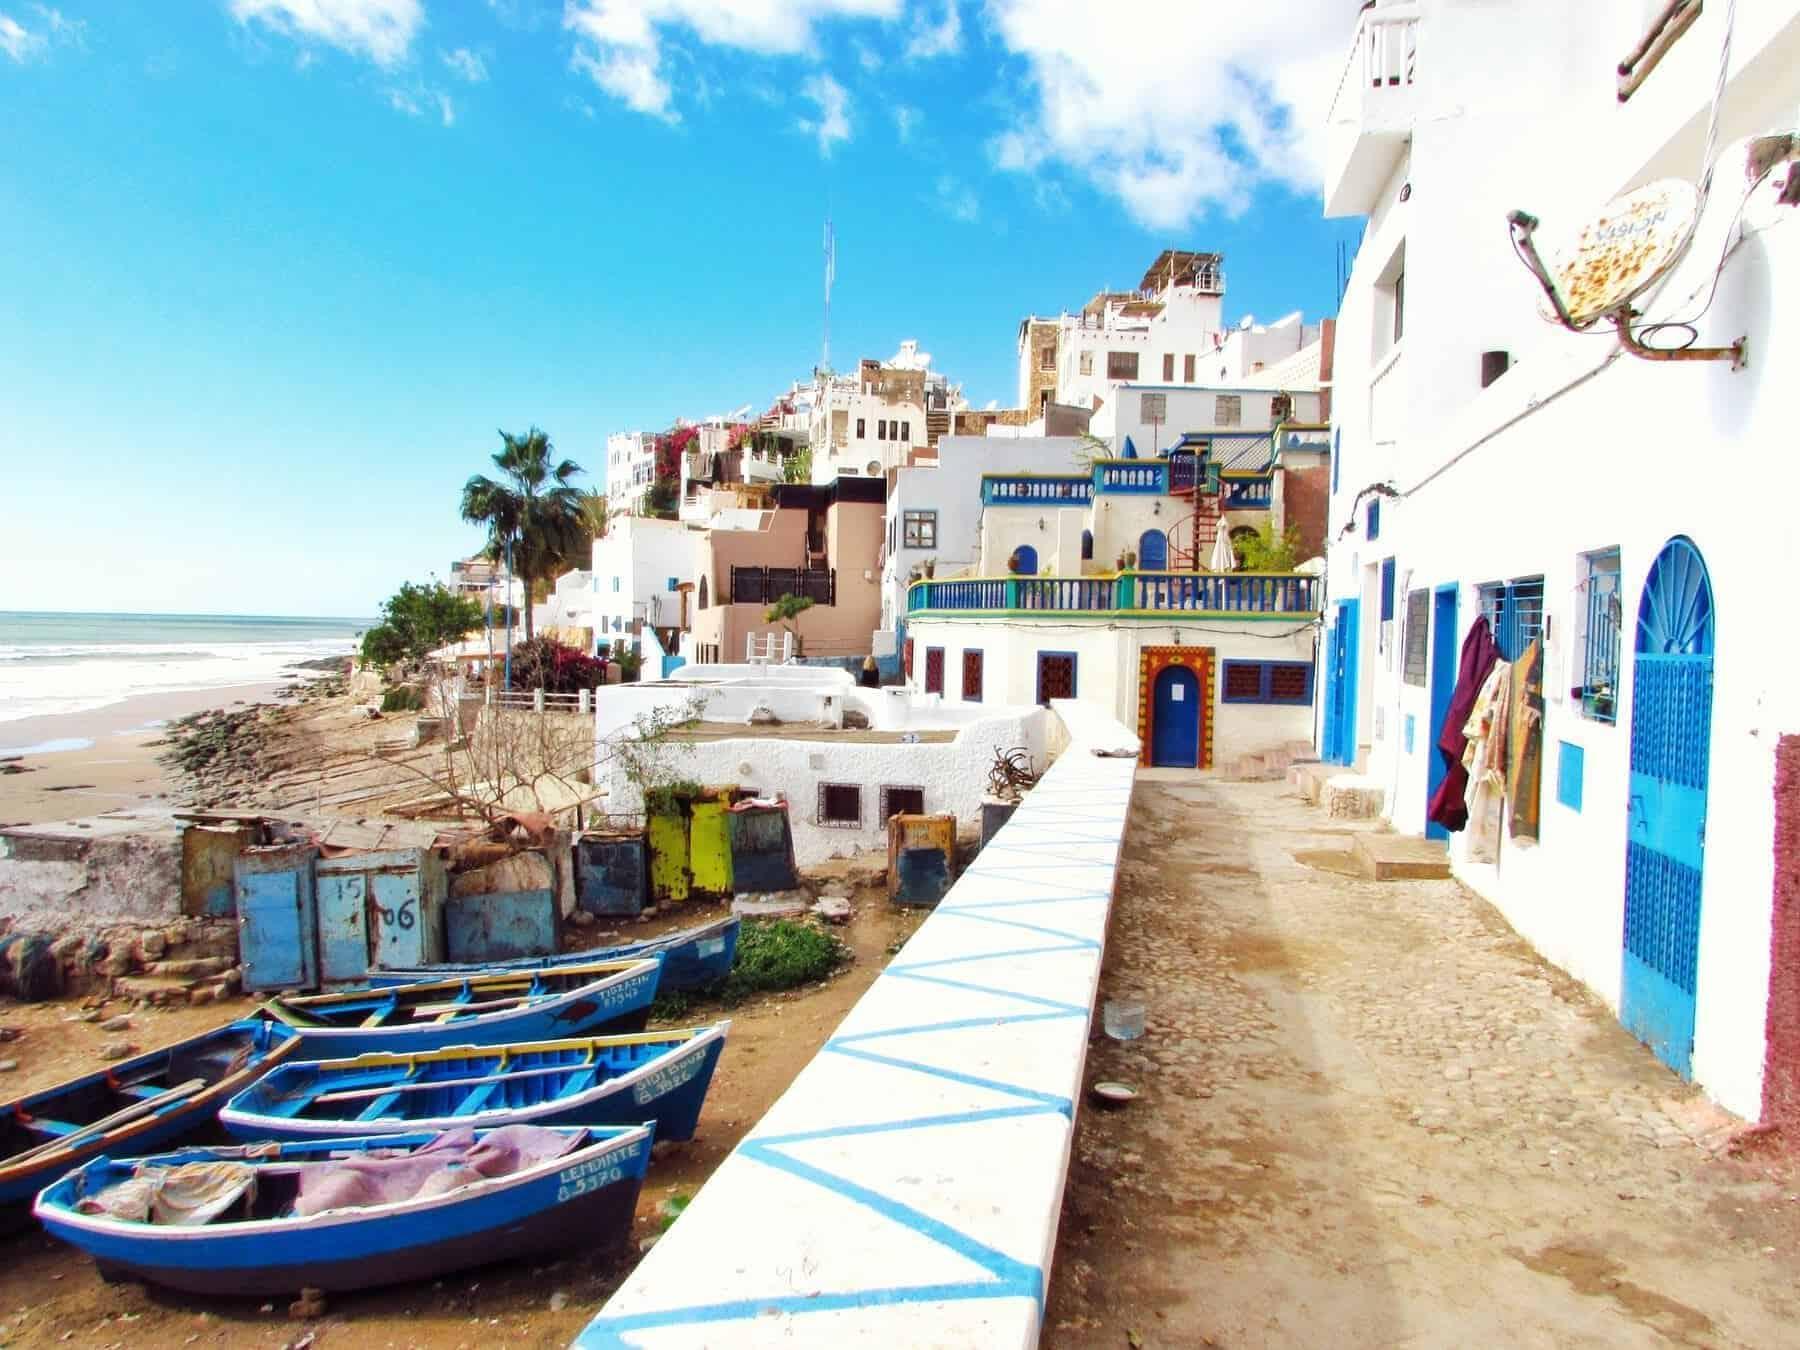 Morocco, Boat on shore louis-hansel